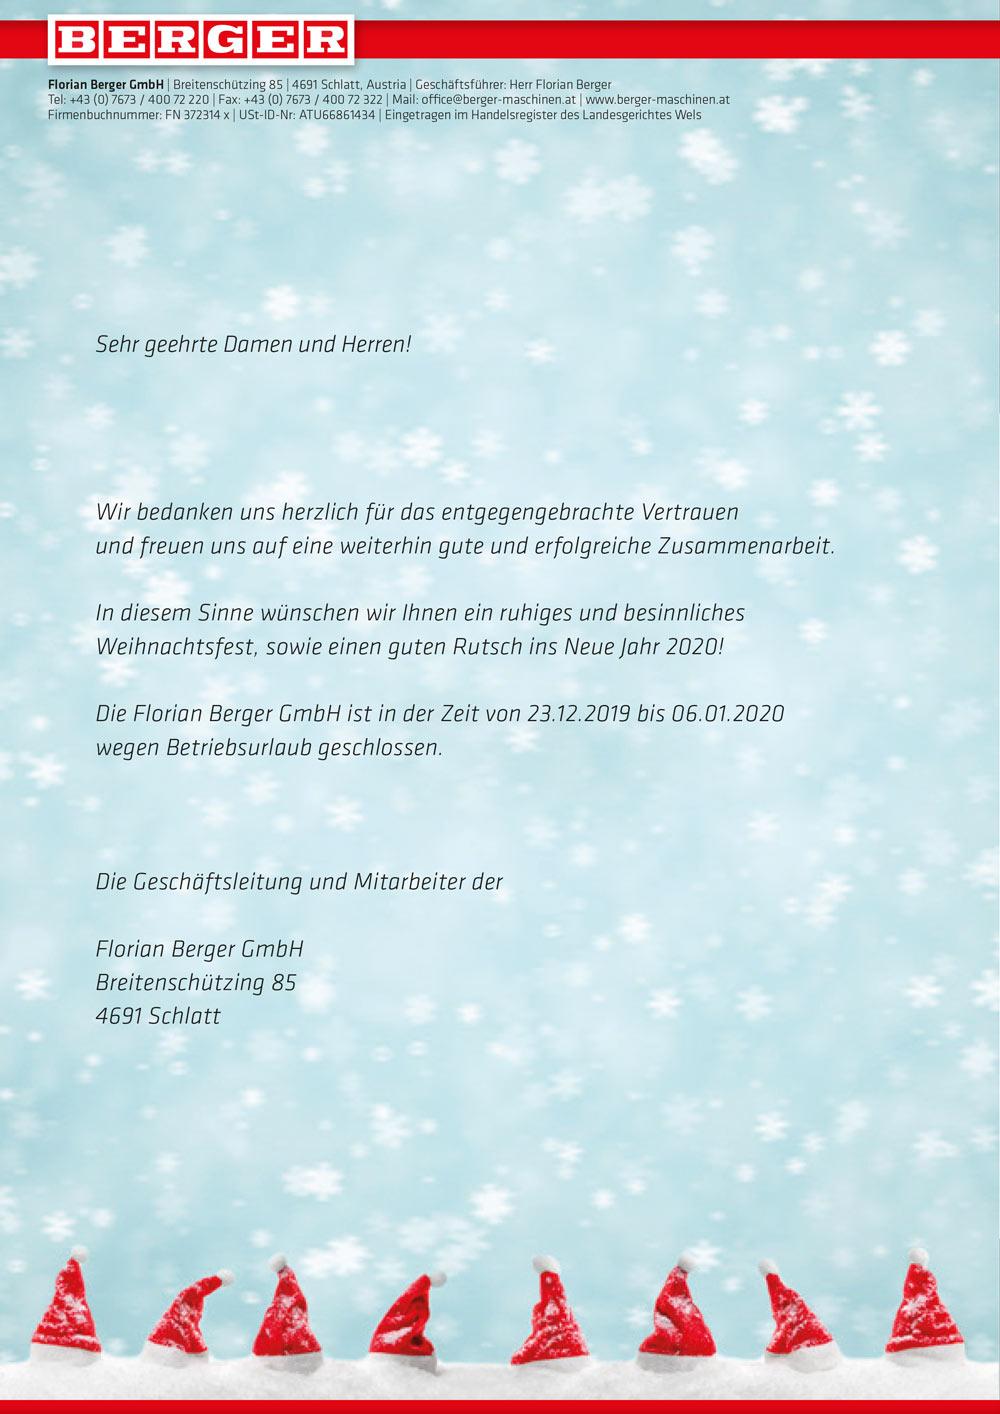 1358_weihnachtsbriefe_FB_1119_2TiIOvRHCRgRoD